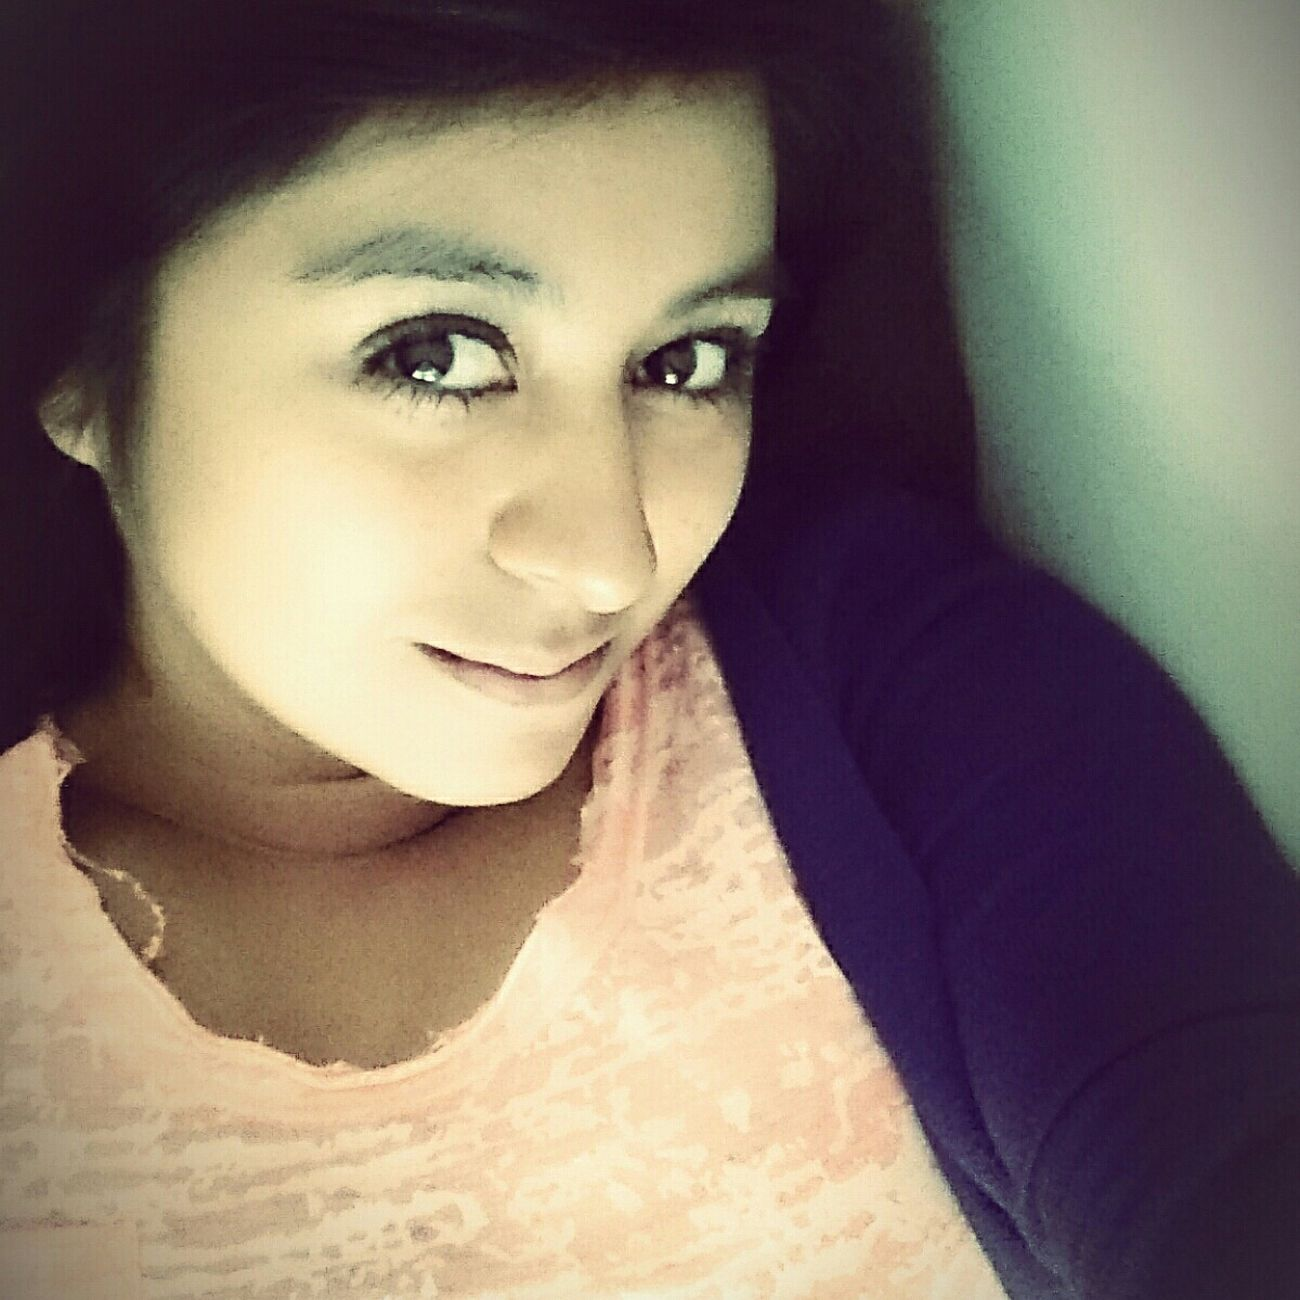 Bonita Linda Ojitos<3 Selfie ✌ *-* Ojasos De La Niña<3 BlackHair♠♣ Casual Look